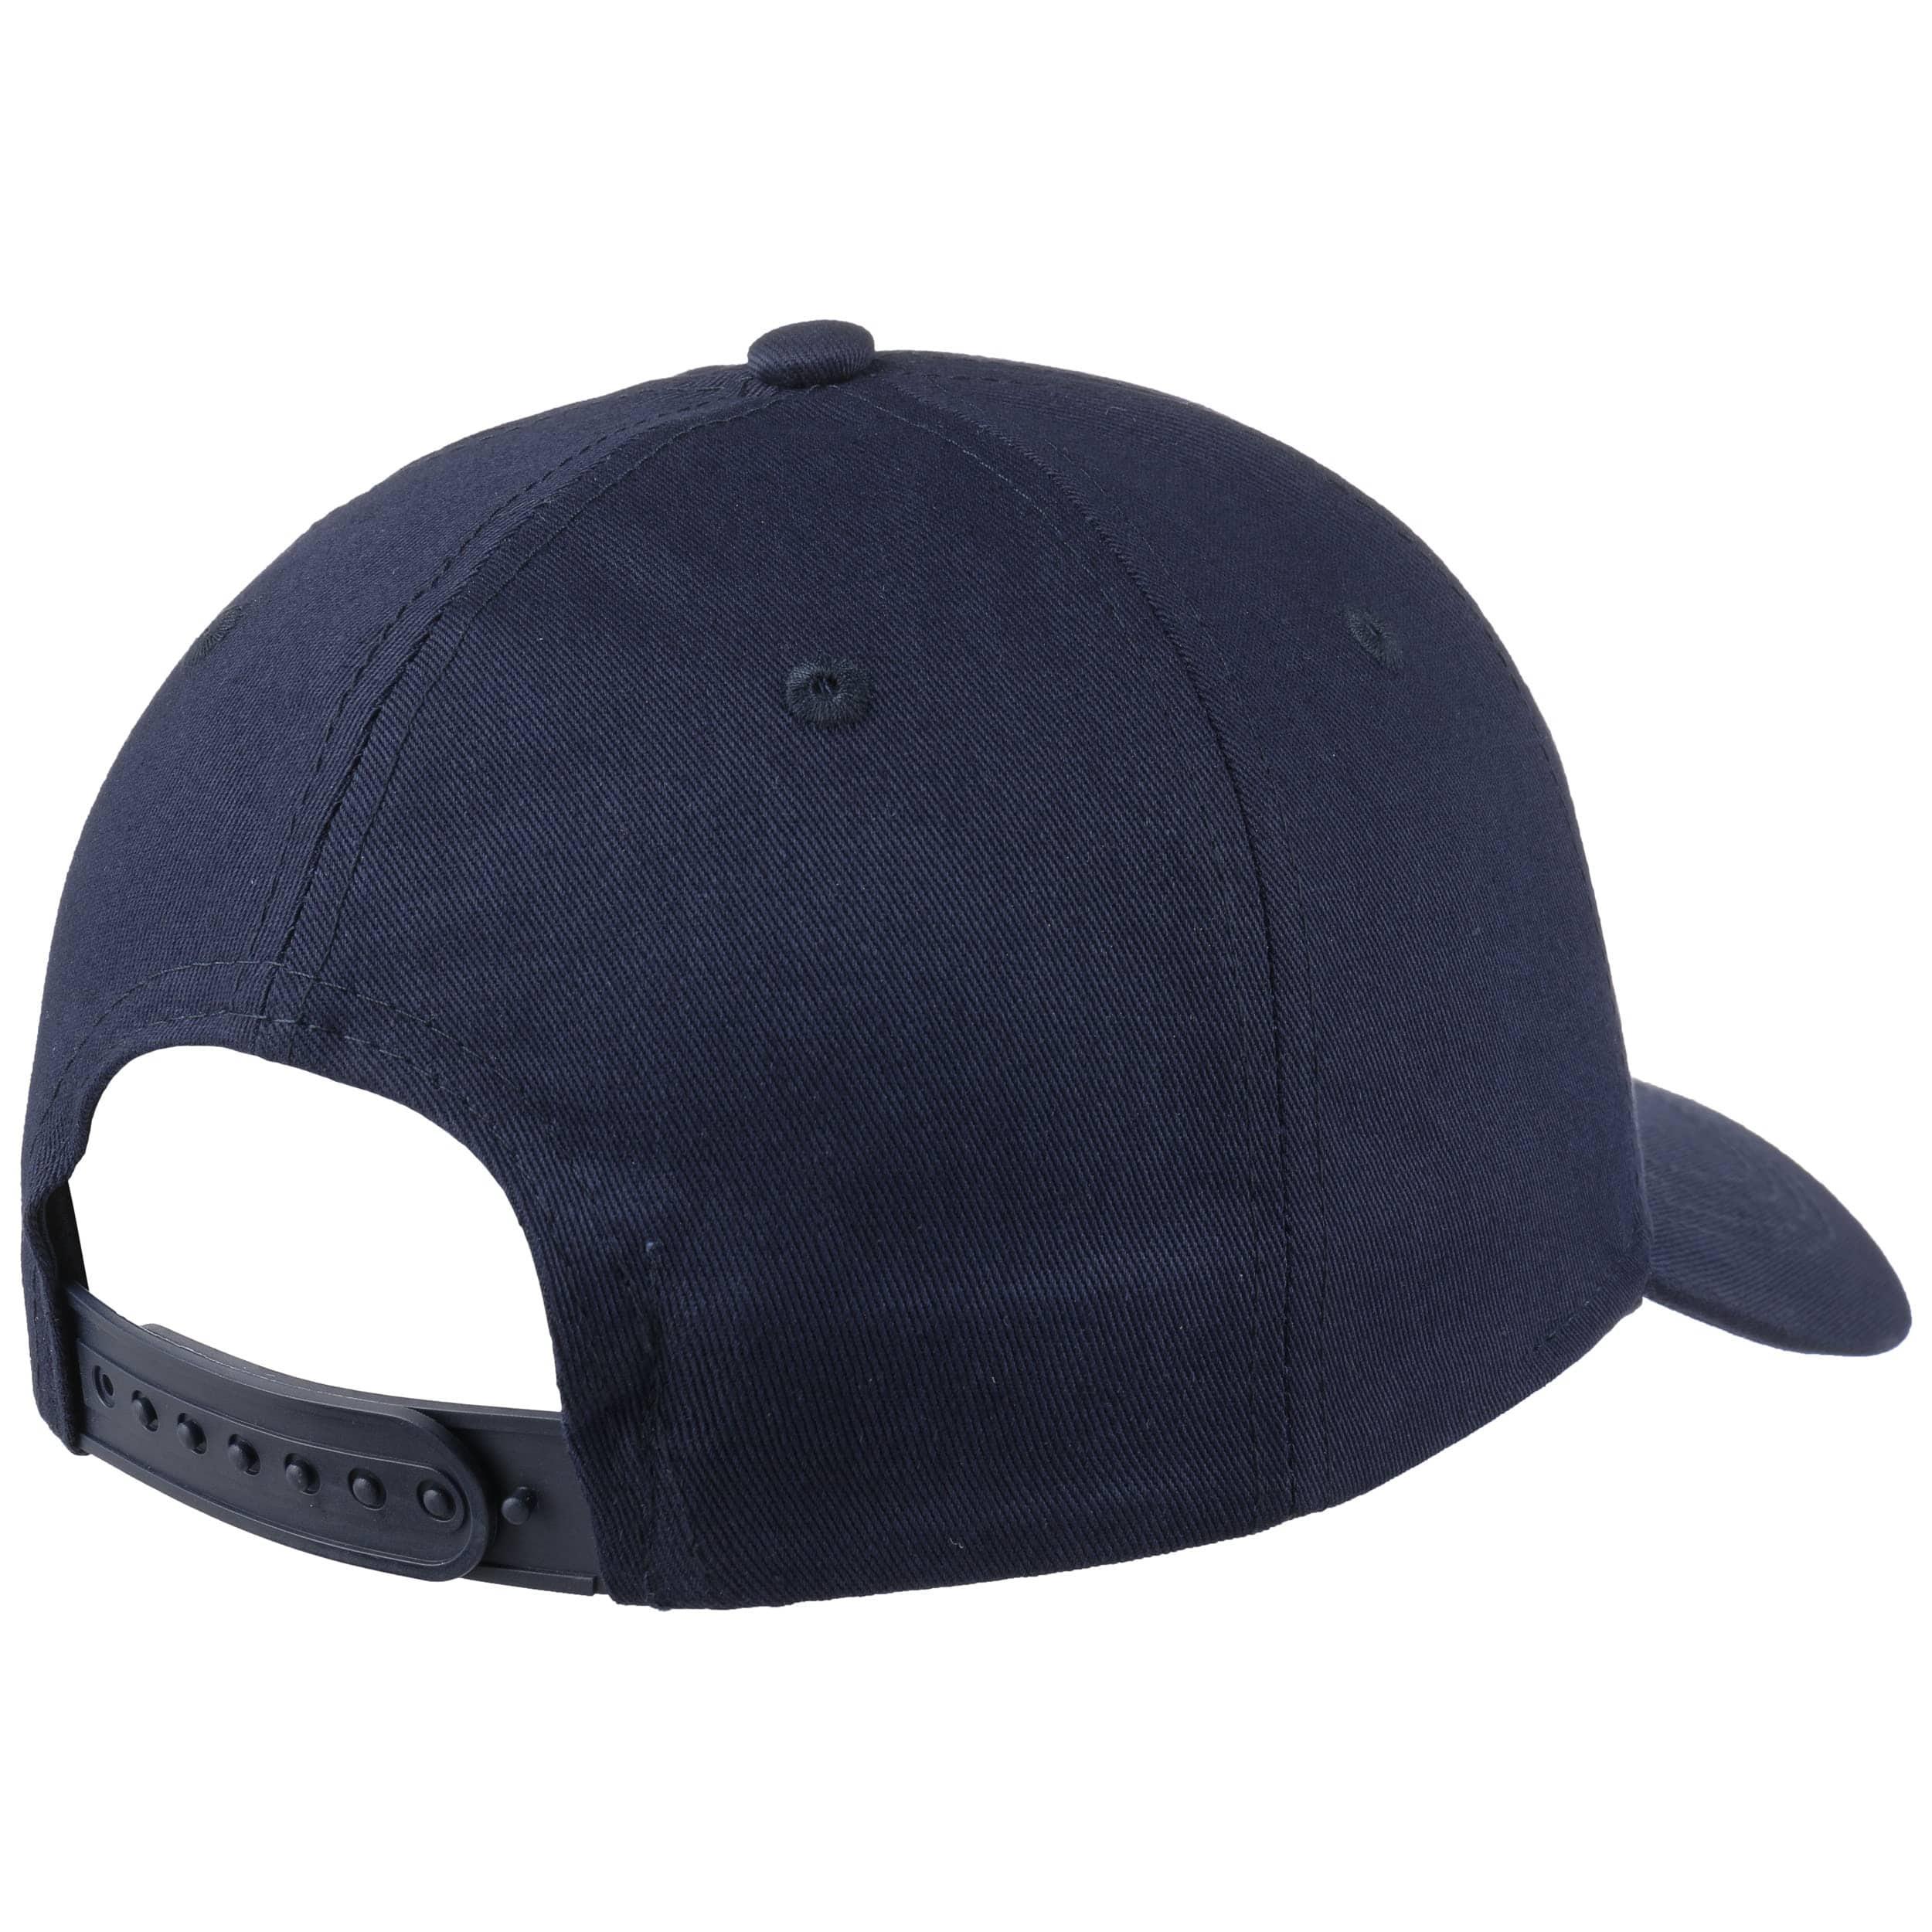 Image result for snapback cap